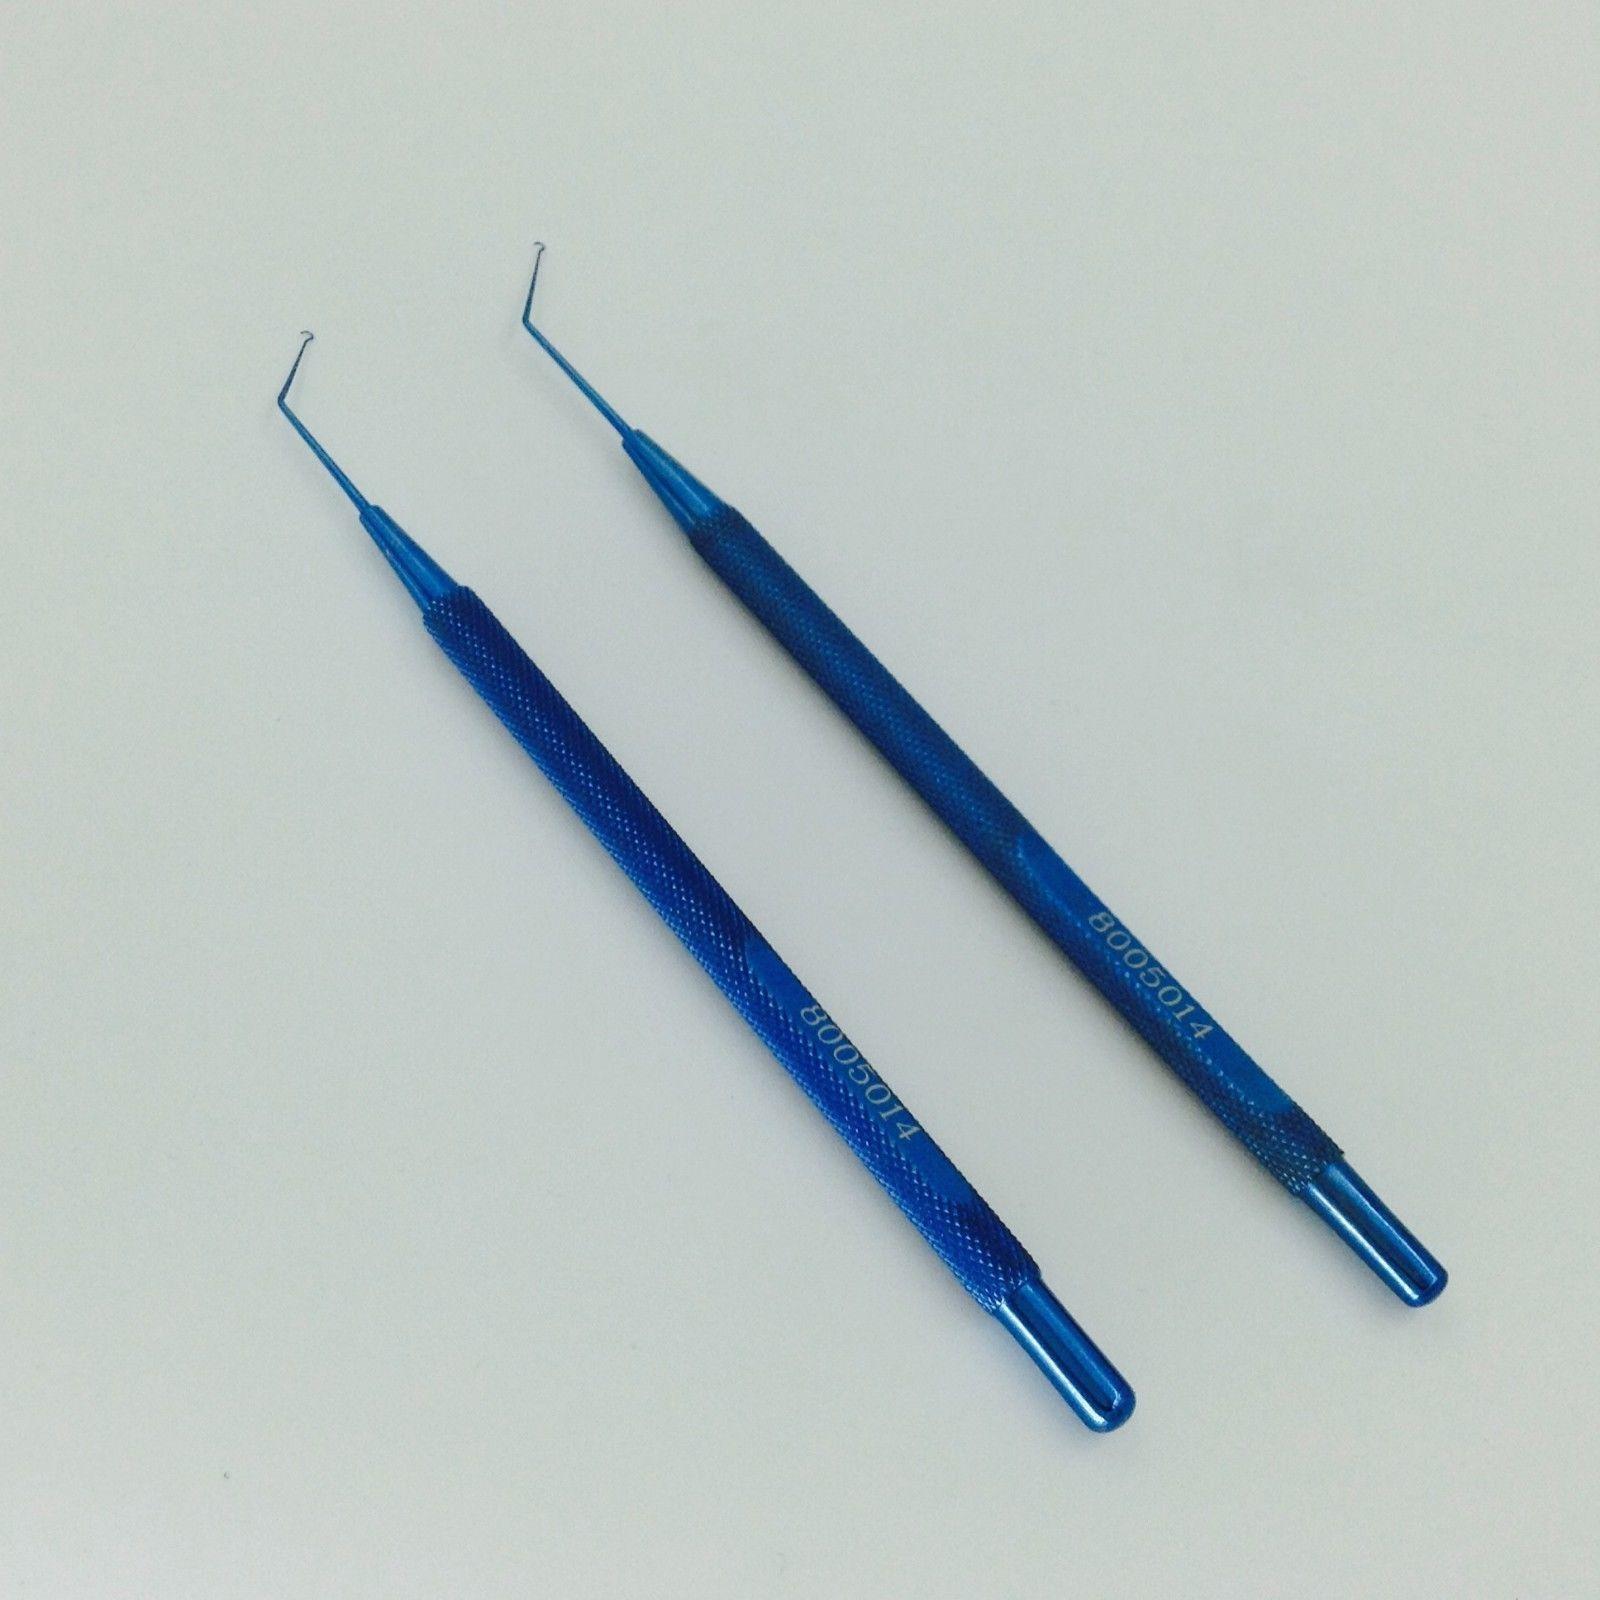 2PCS NEW titanium Jaffe-Knolle Iris Hook ophthalmic instrument